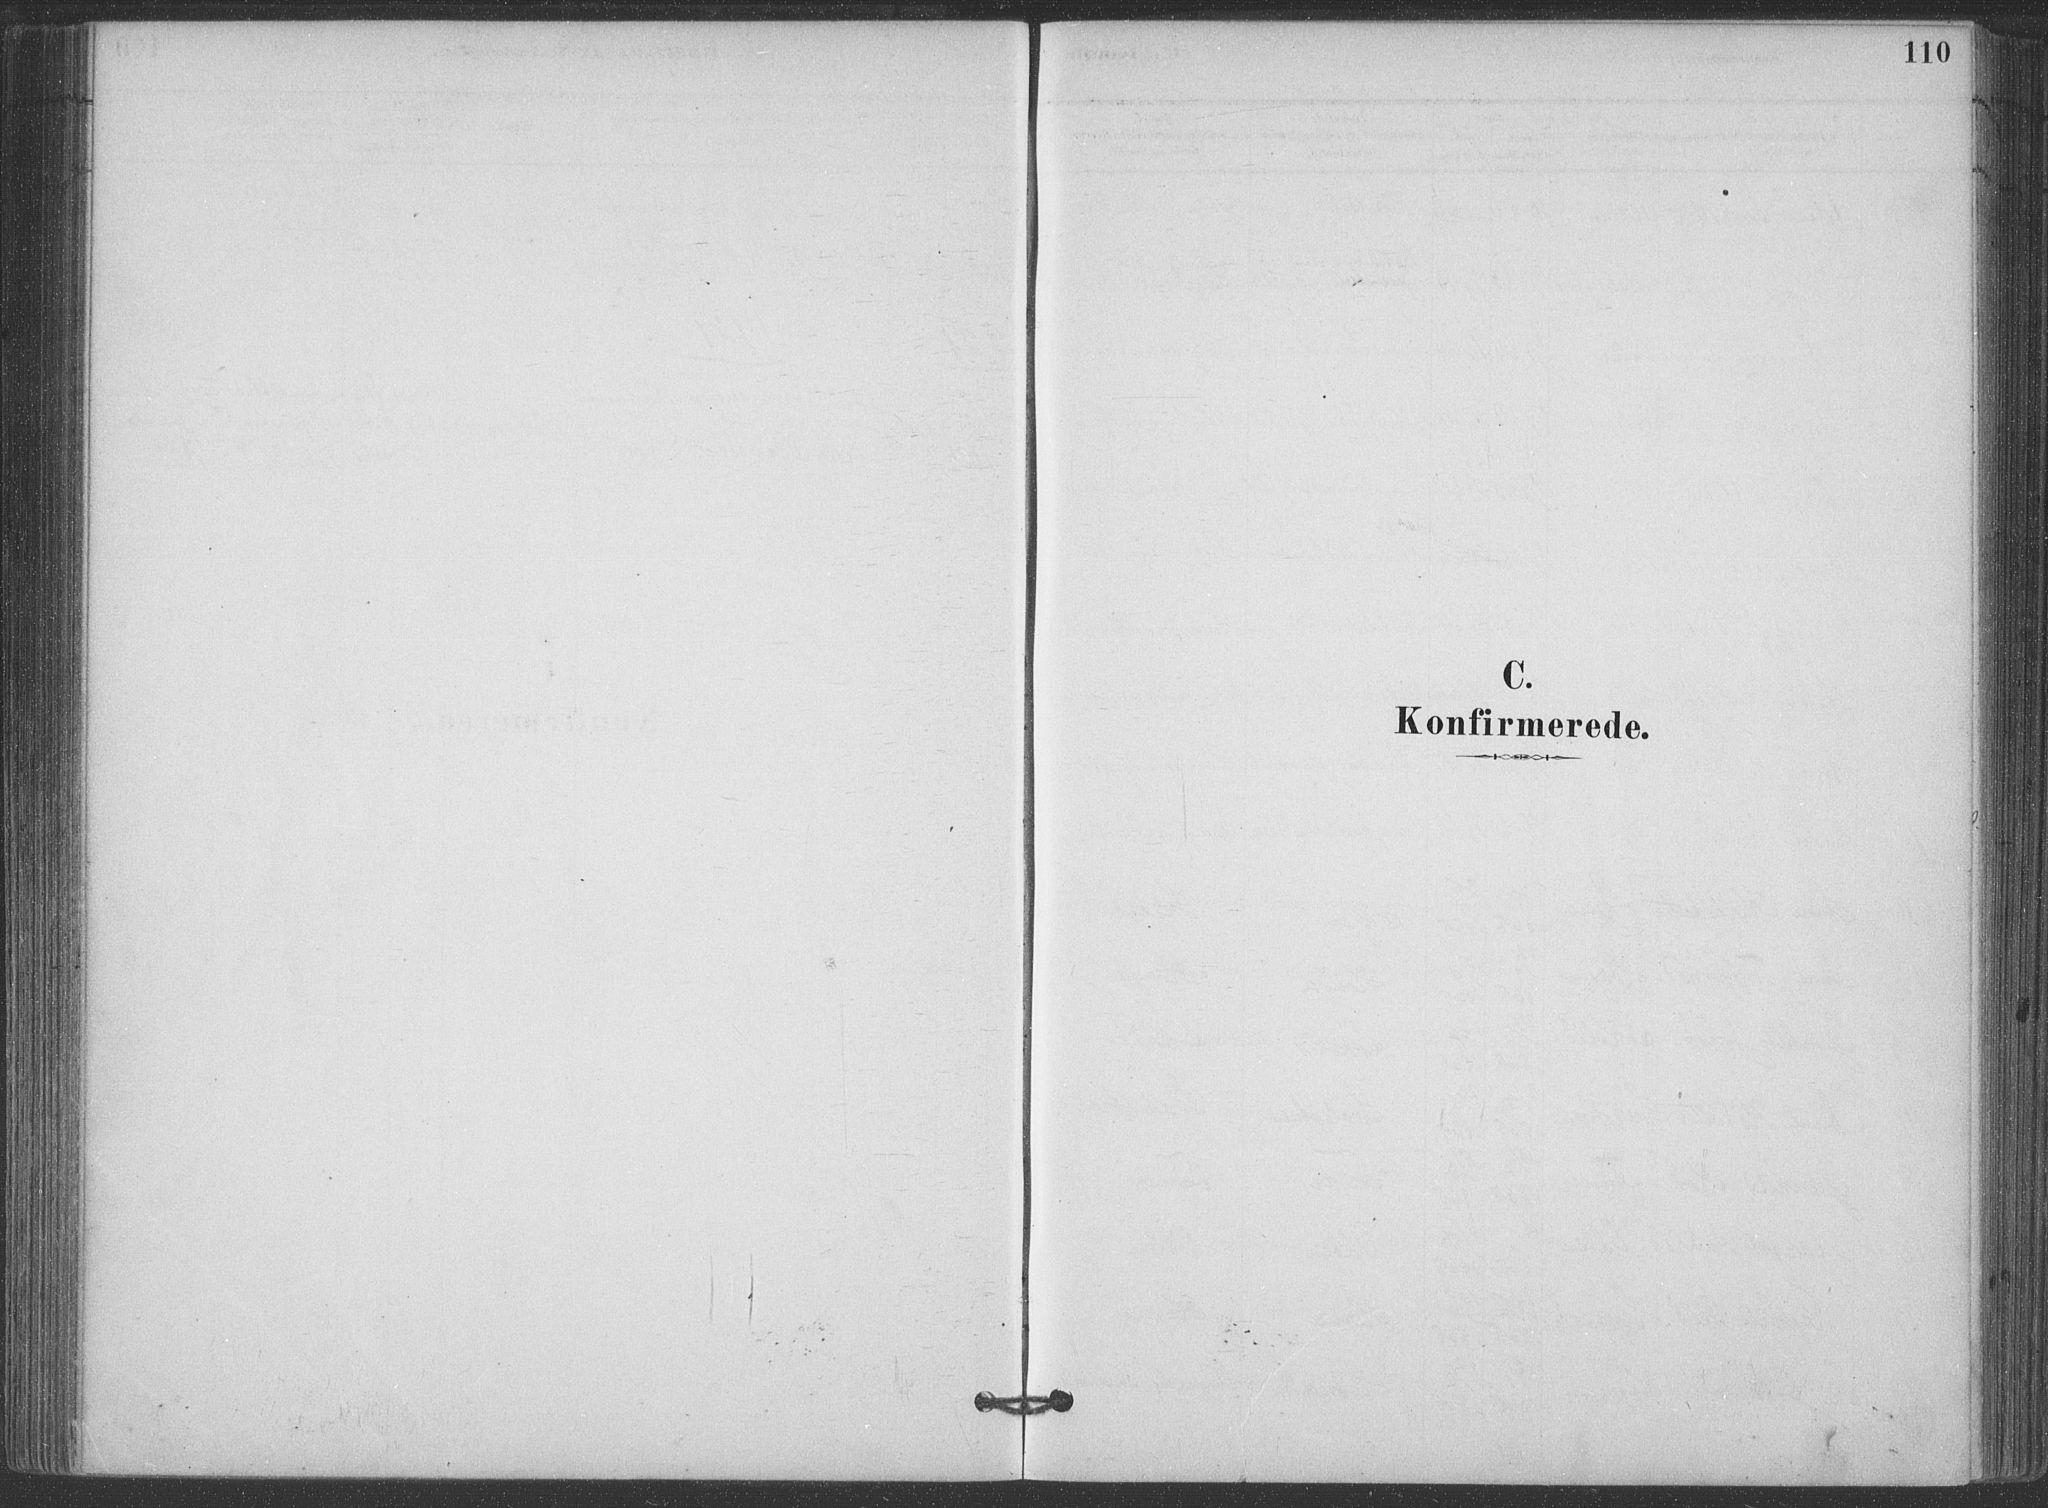 SAKO, Hjartdal kirkebøker, F/Fa/L0010: Ministerialbok nr. I 10, 1880-1929, s. 110